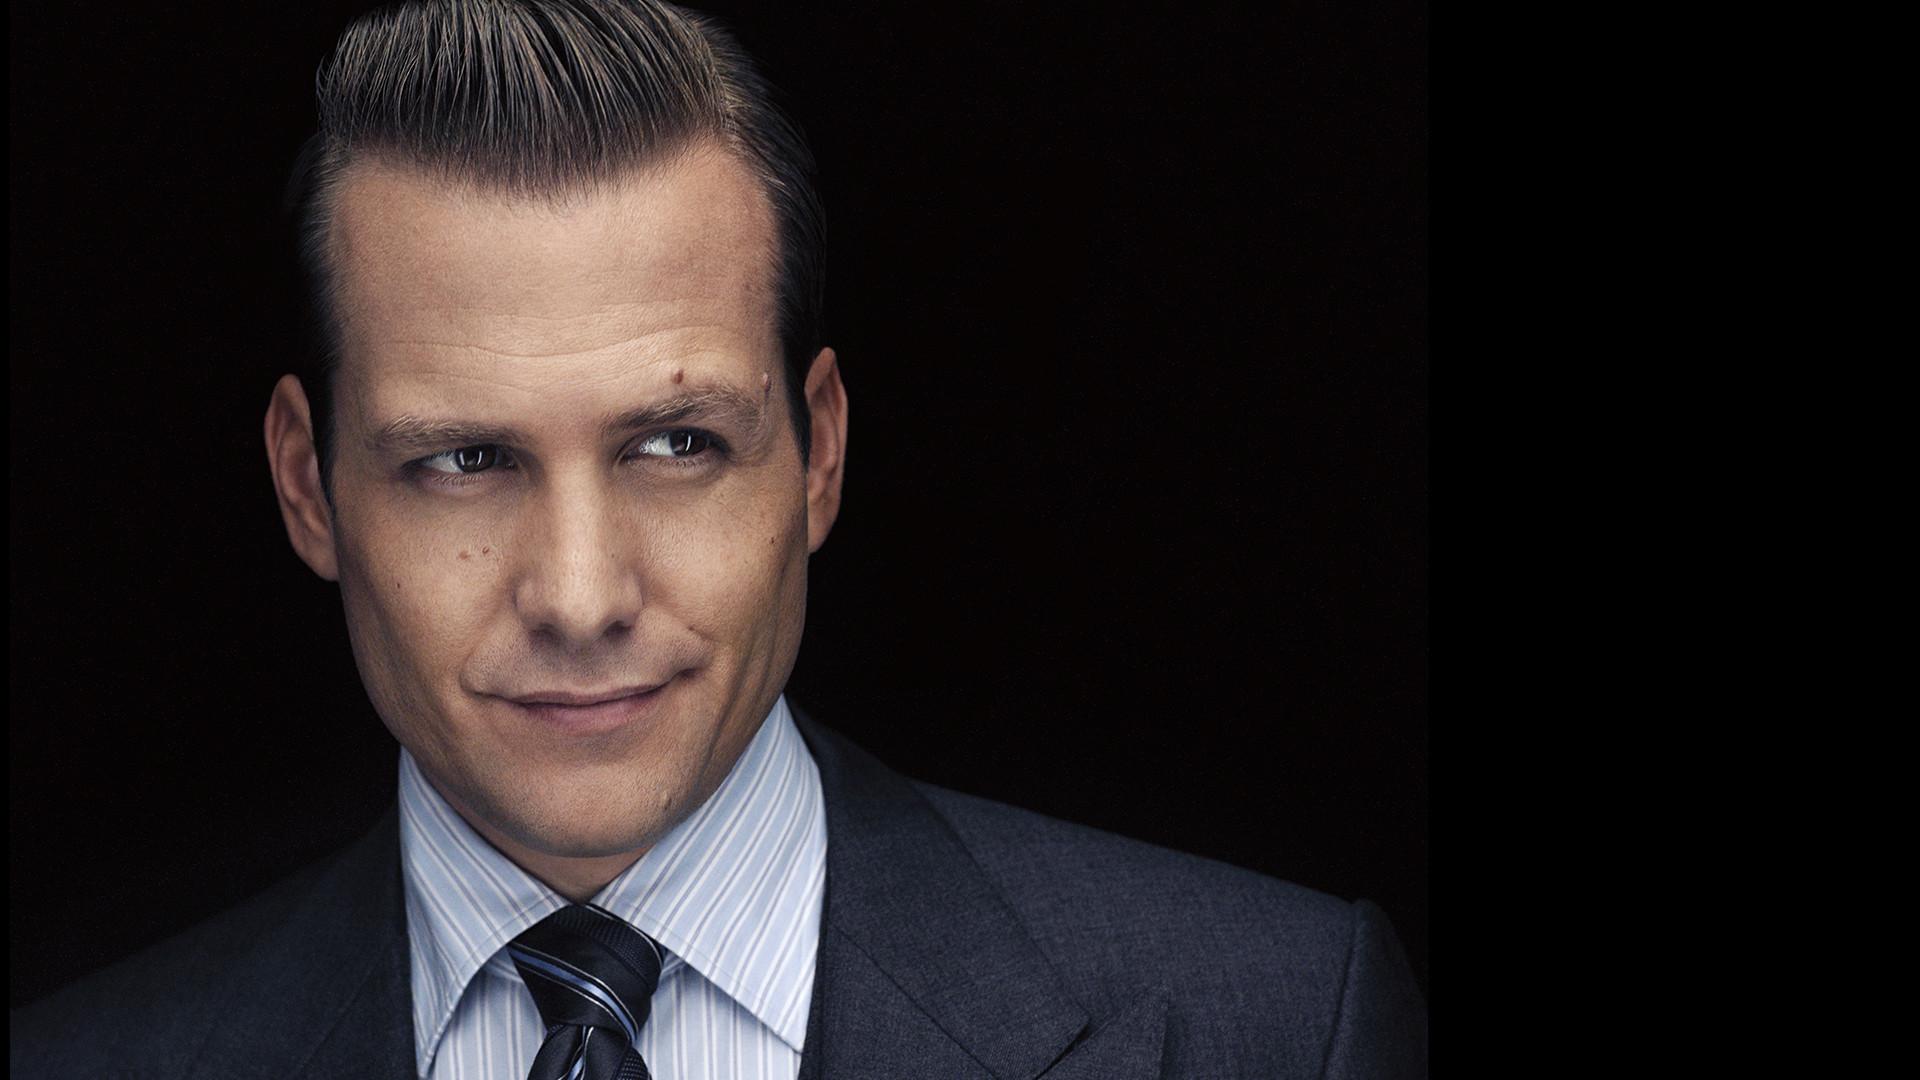 Harvey Specter Quotes Wallpaper Iphone Harvey Specter Wallpaper 78 Images